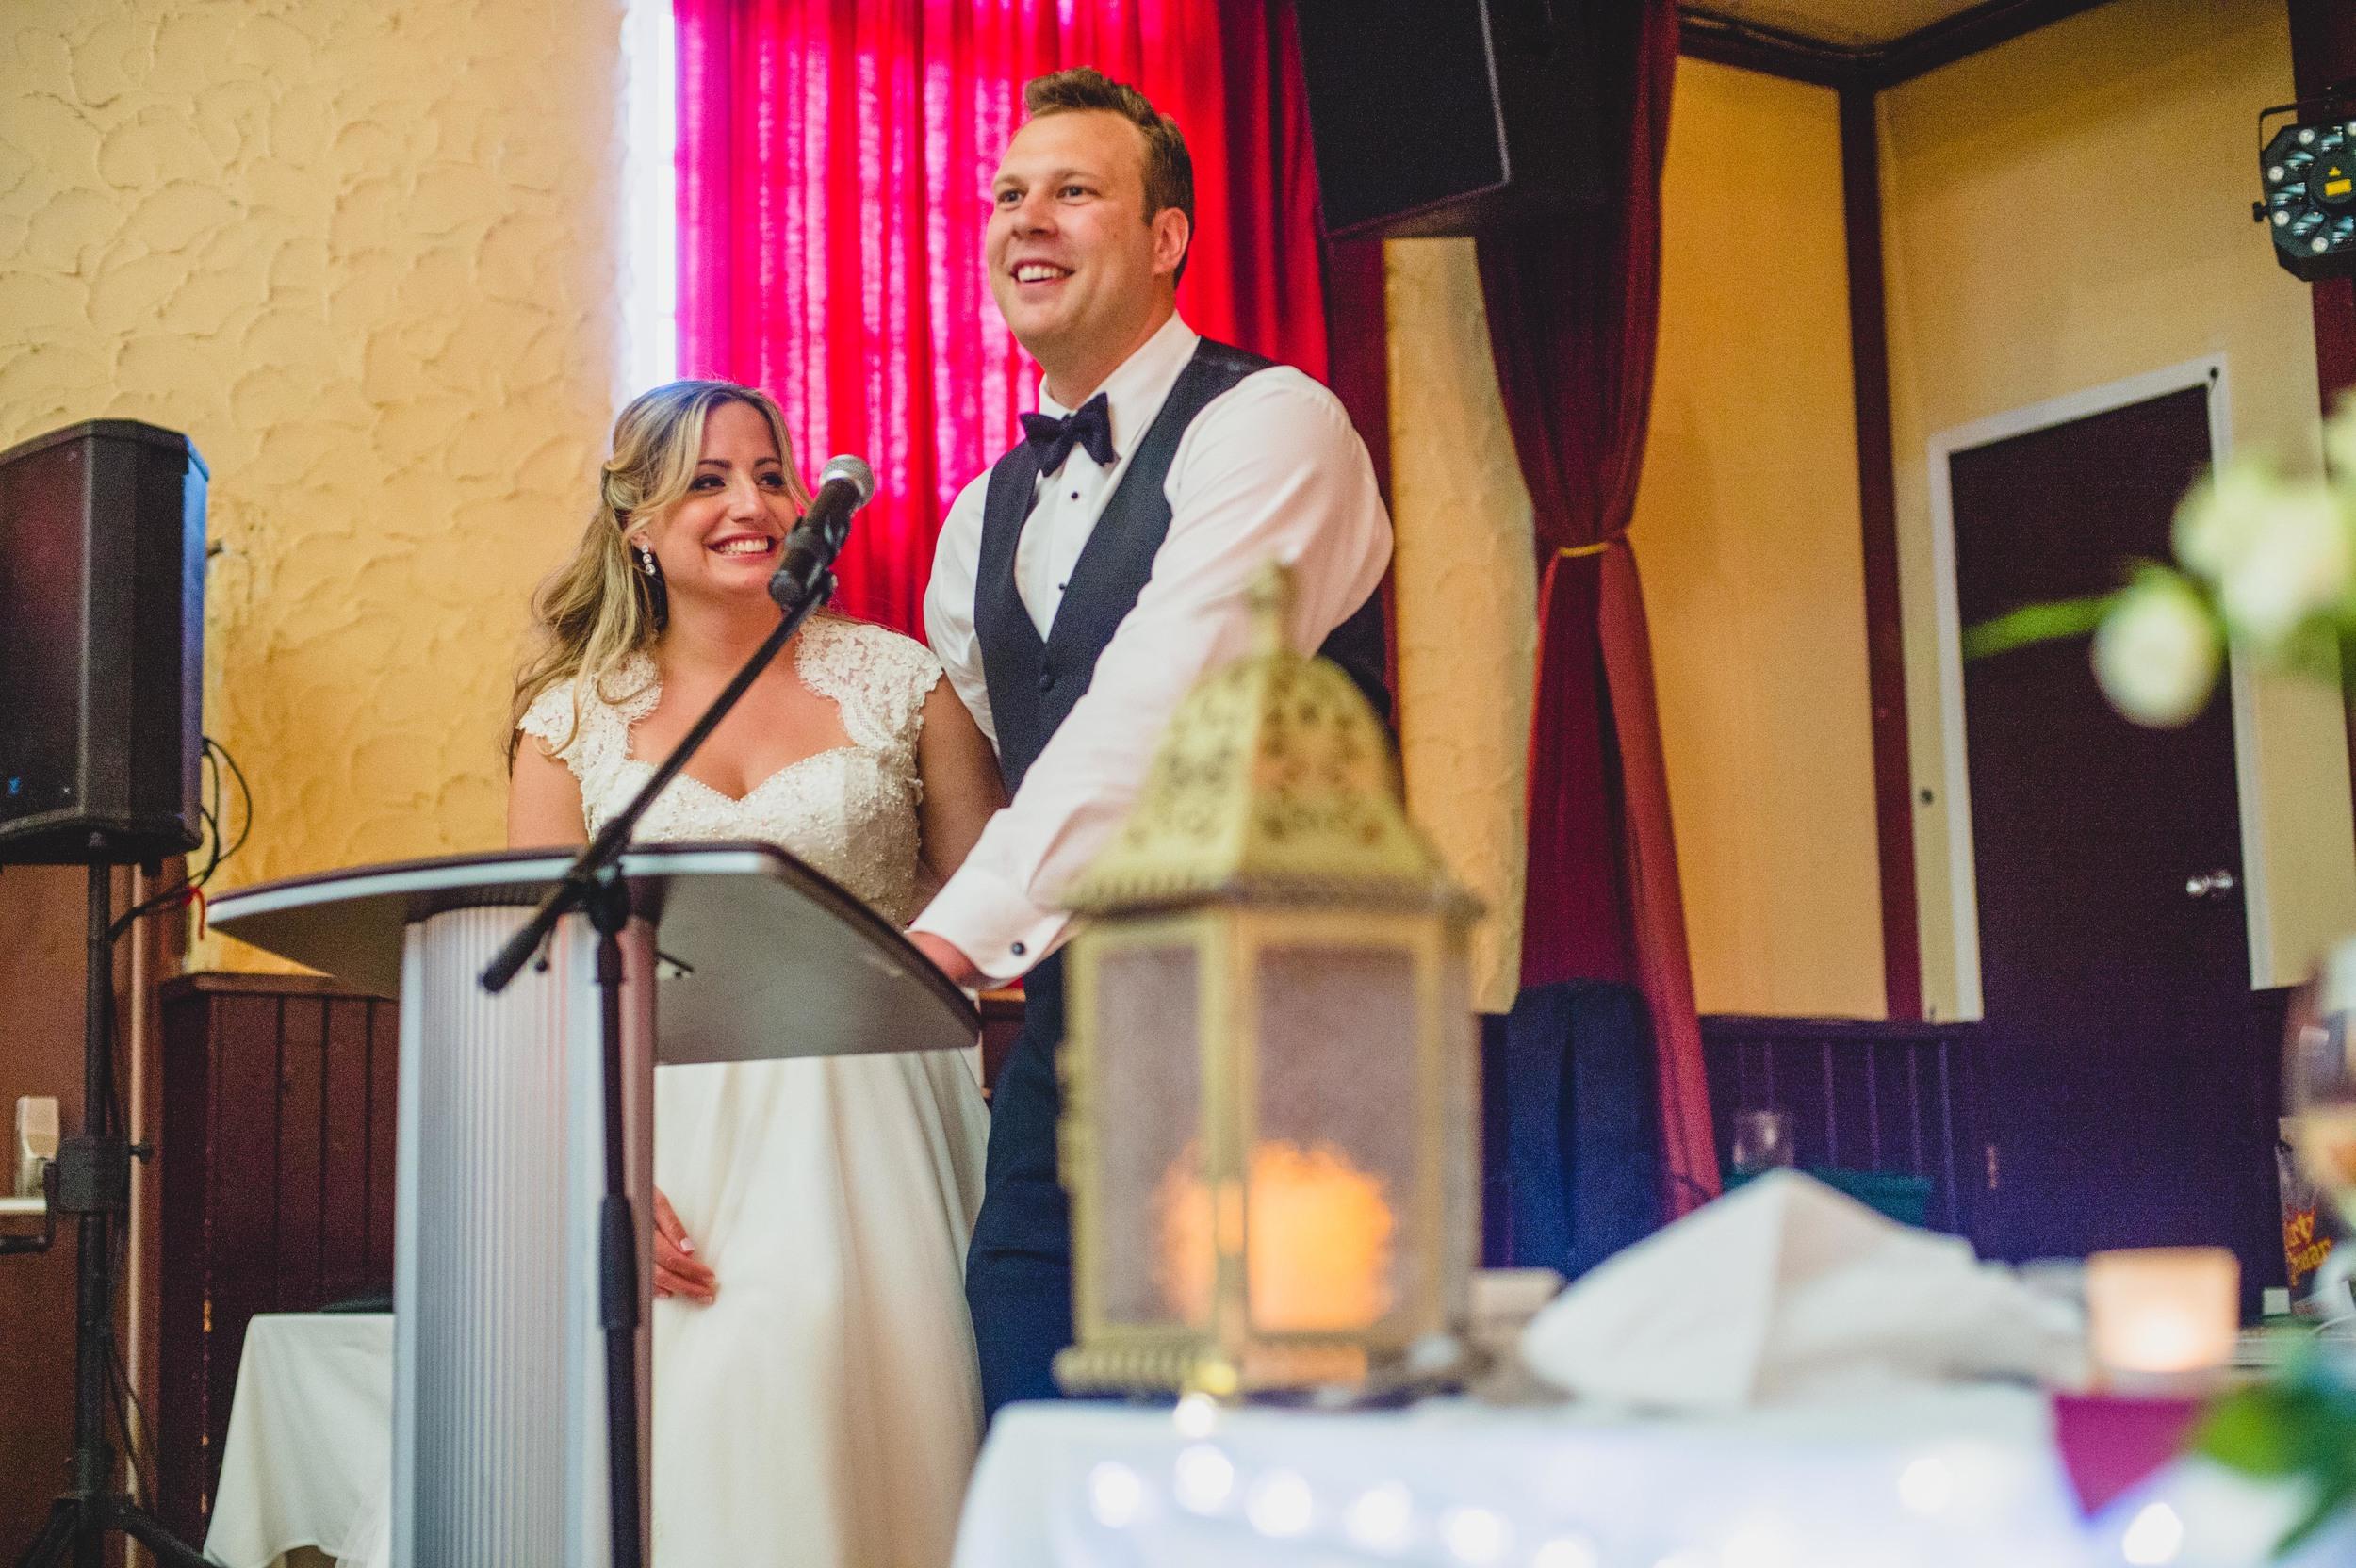 Vancouver St Augustine 's Church wedding photographer edward lai photography-85.jpg